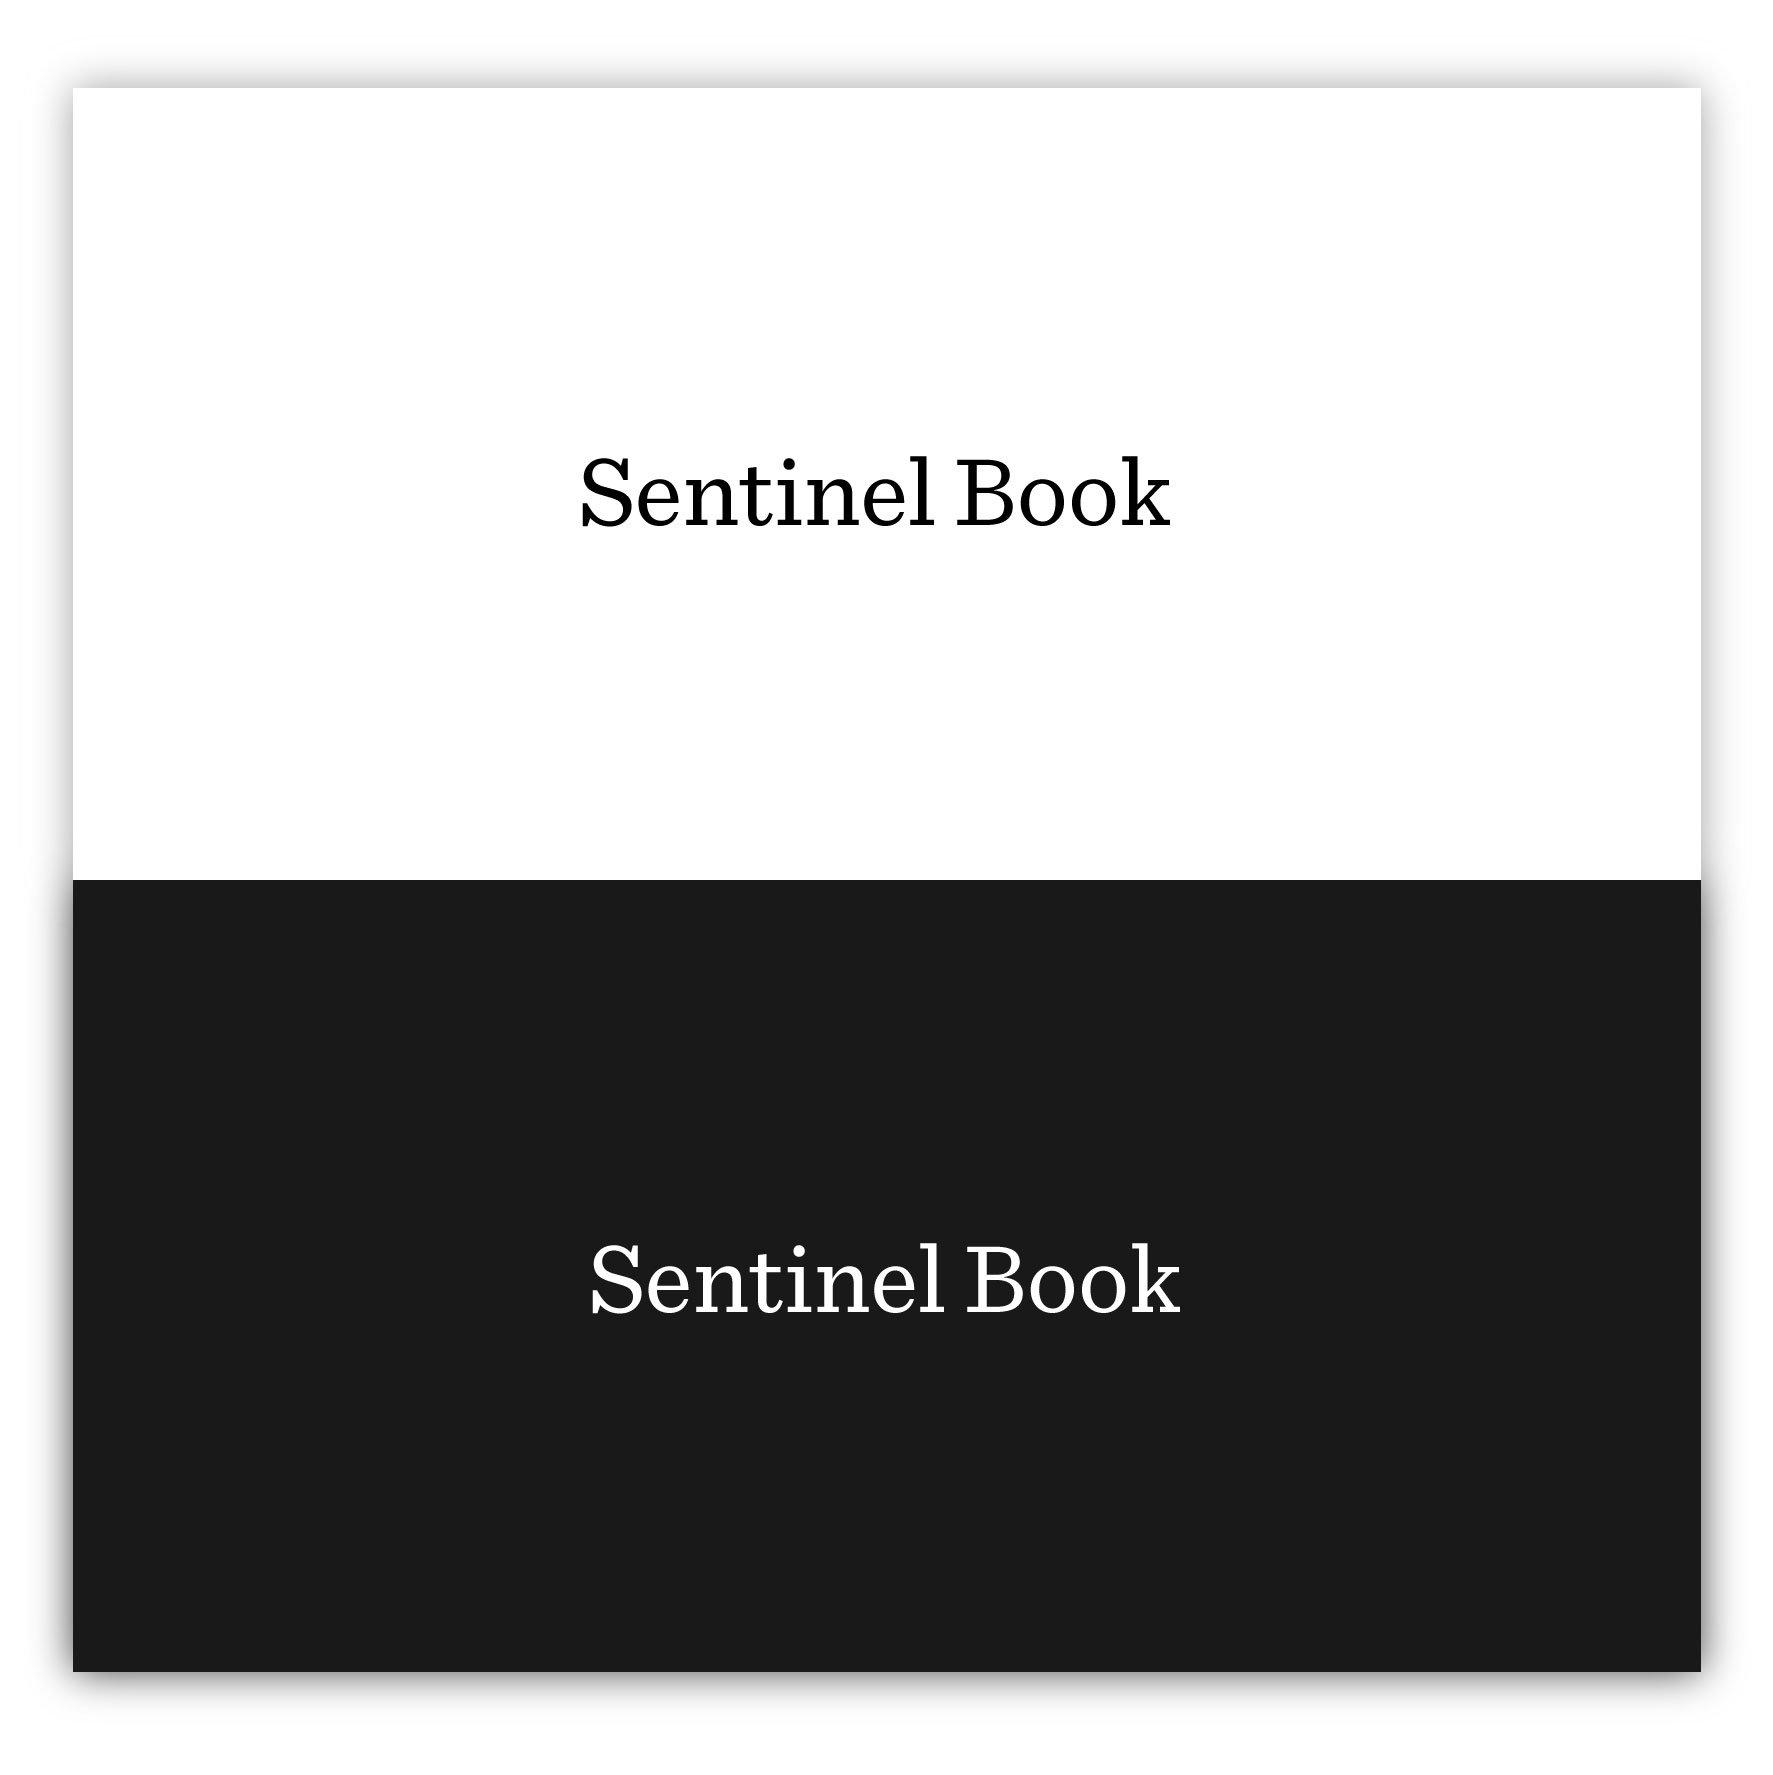 Sentinel Book Font - Free modern fonts for 2020